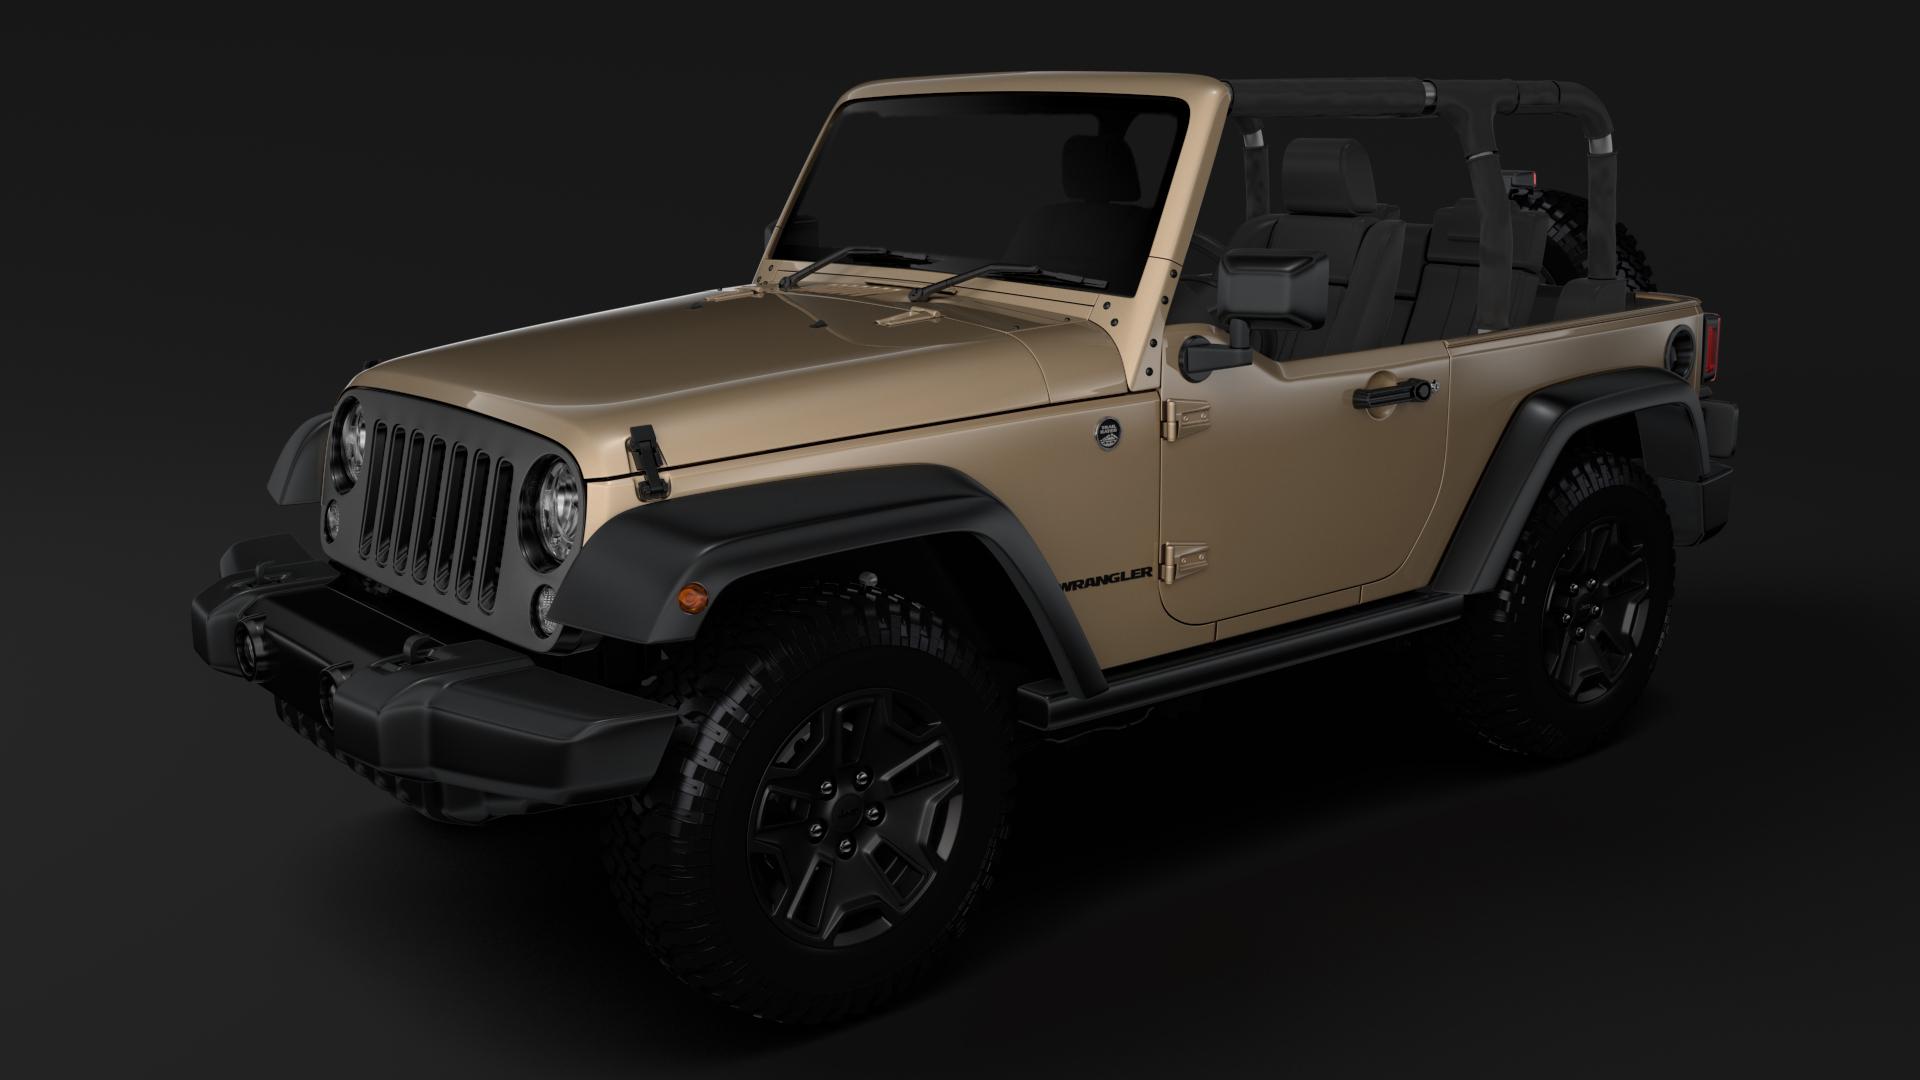 jeep wrangler willys wheeler jk 2017 3d model max fbx c4d lwo ma mb hrc xsi obj 276794